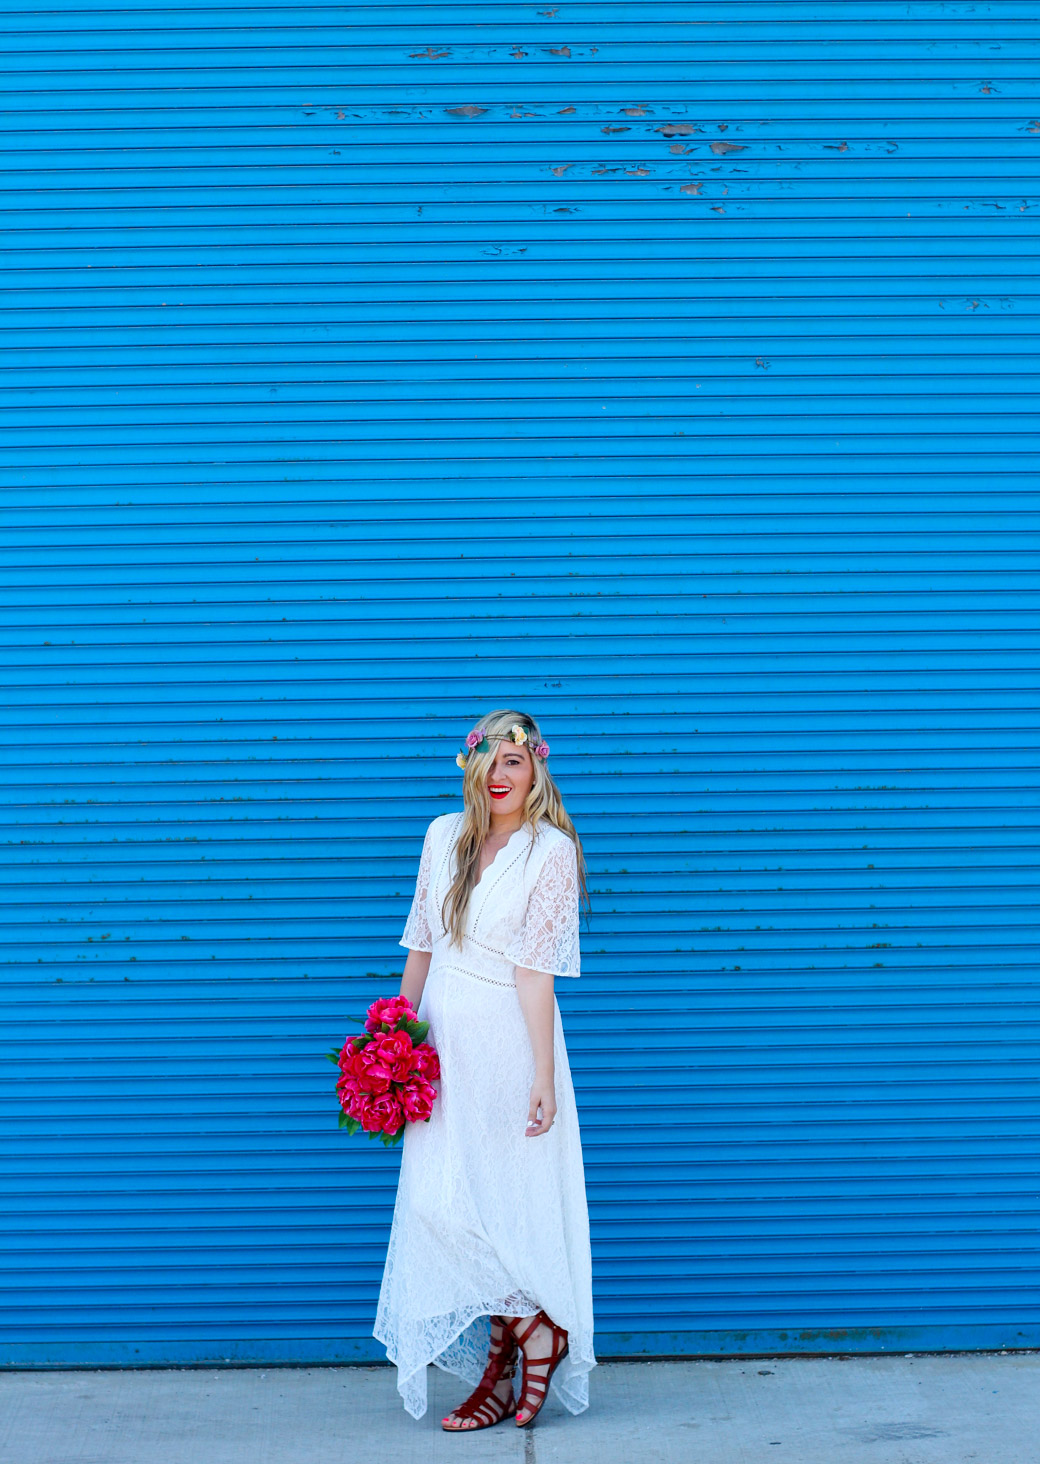 modcloth-wedding-dress-chicago-fashion-blogger-4